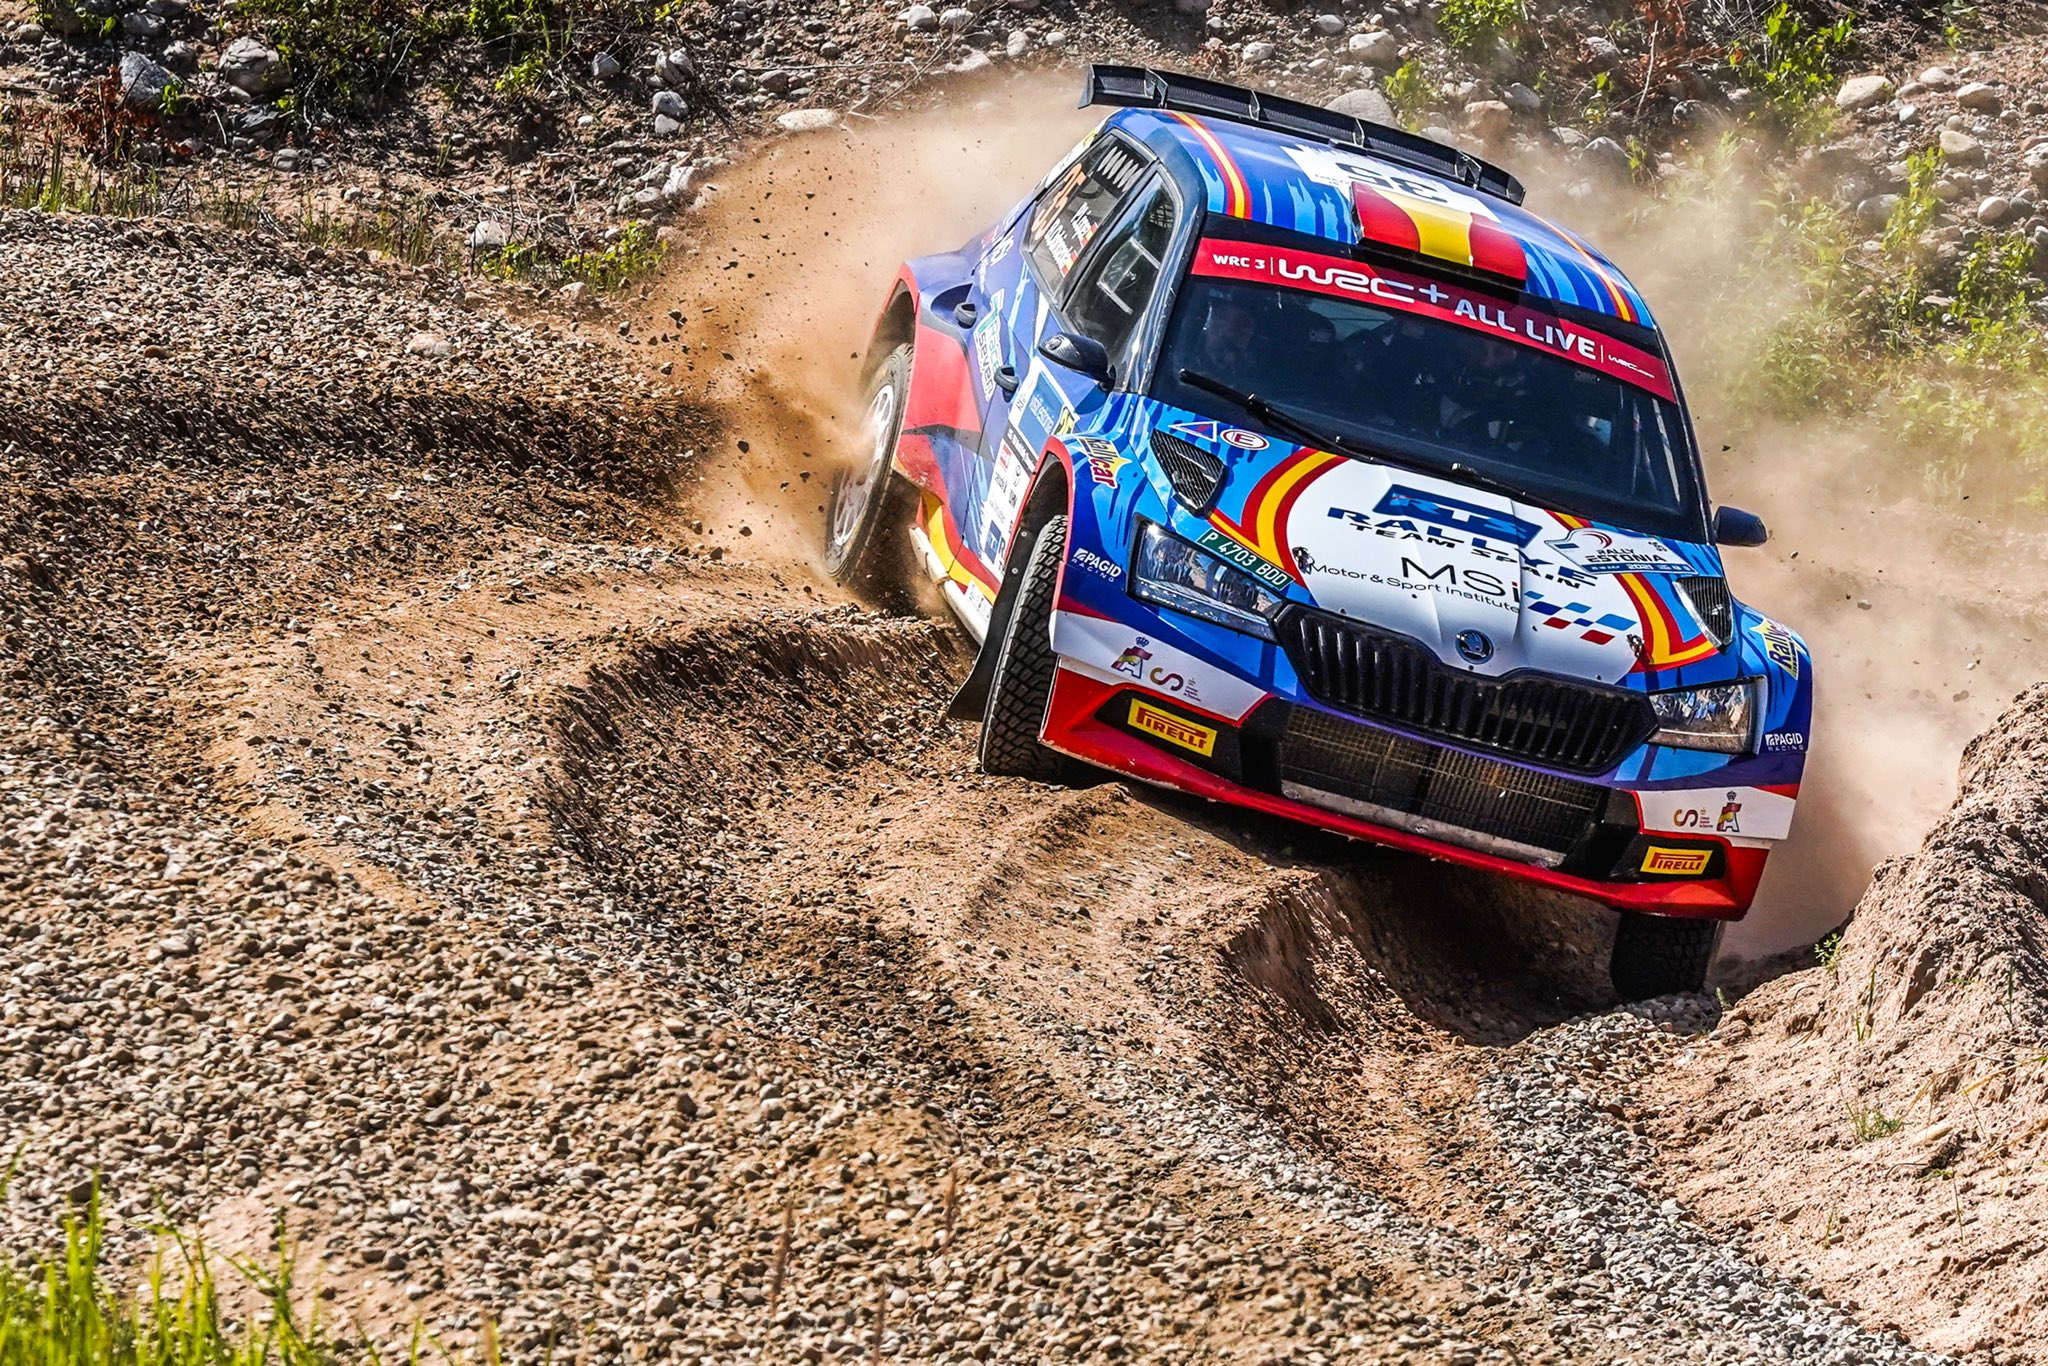 WRC: 11º Rally Estonia [15-18 Julio] - Página 3 E6j-mMlWQAMwMe8?format=jpg&name=large